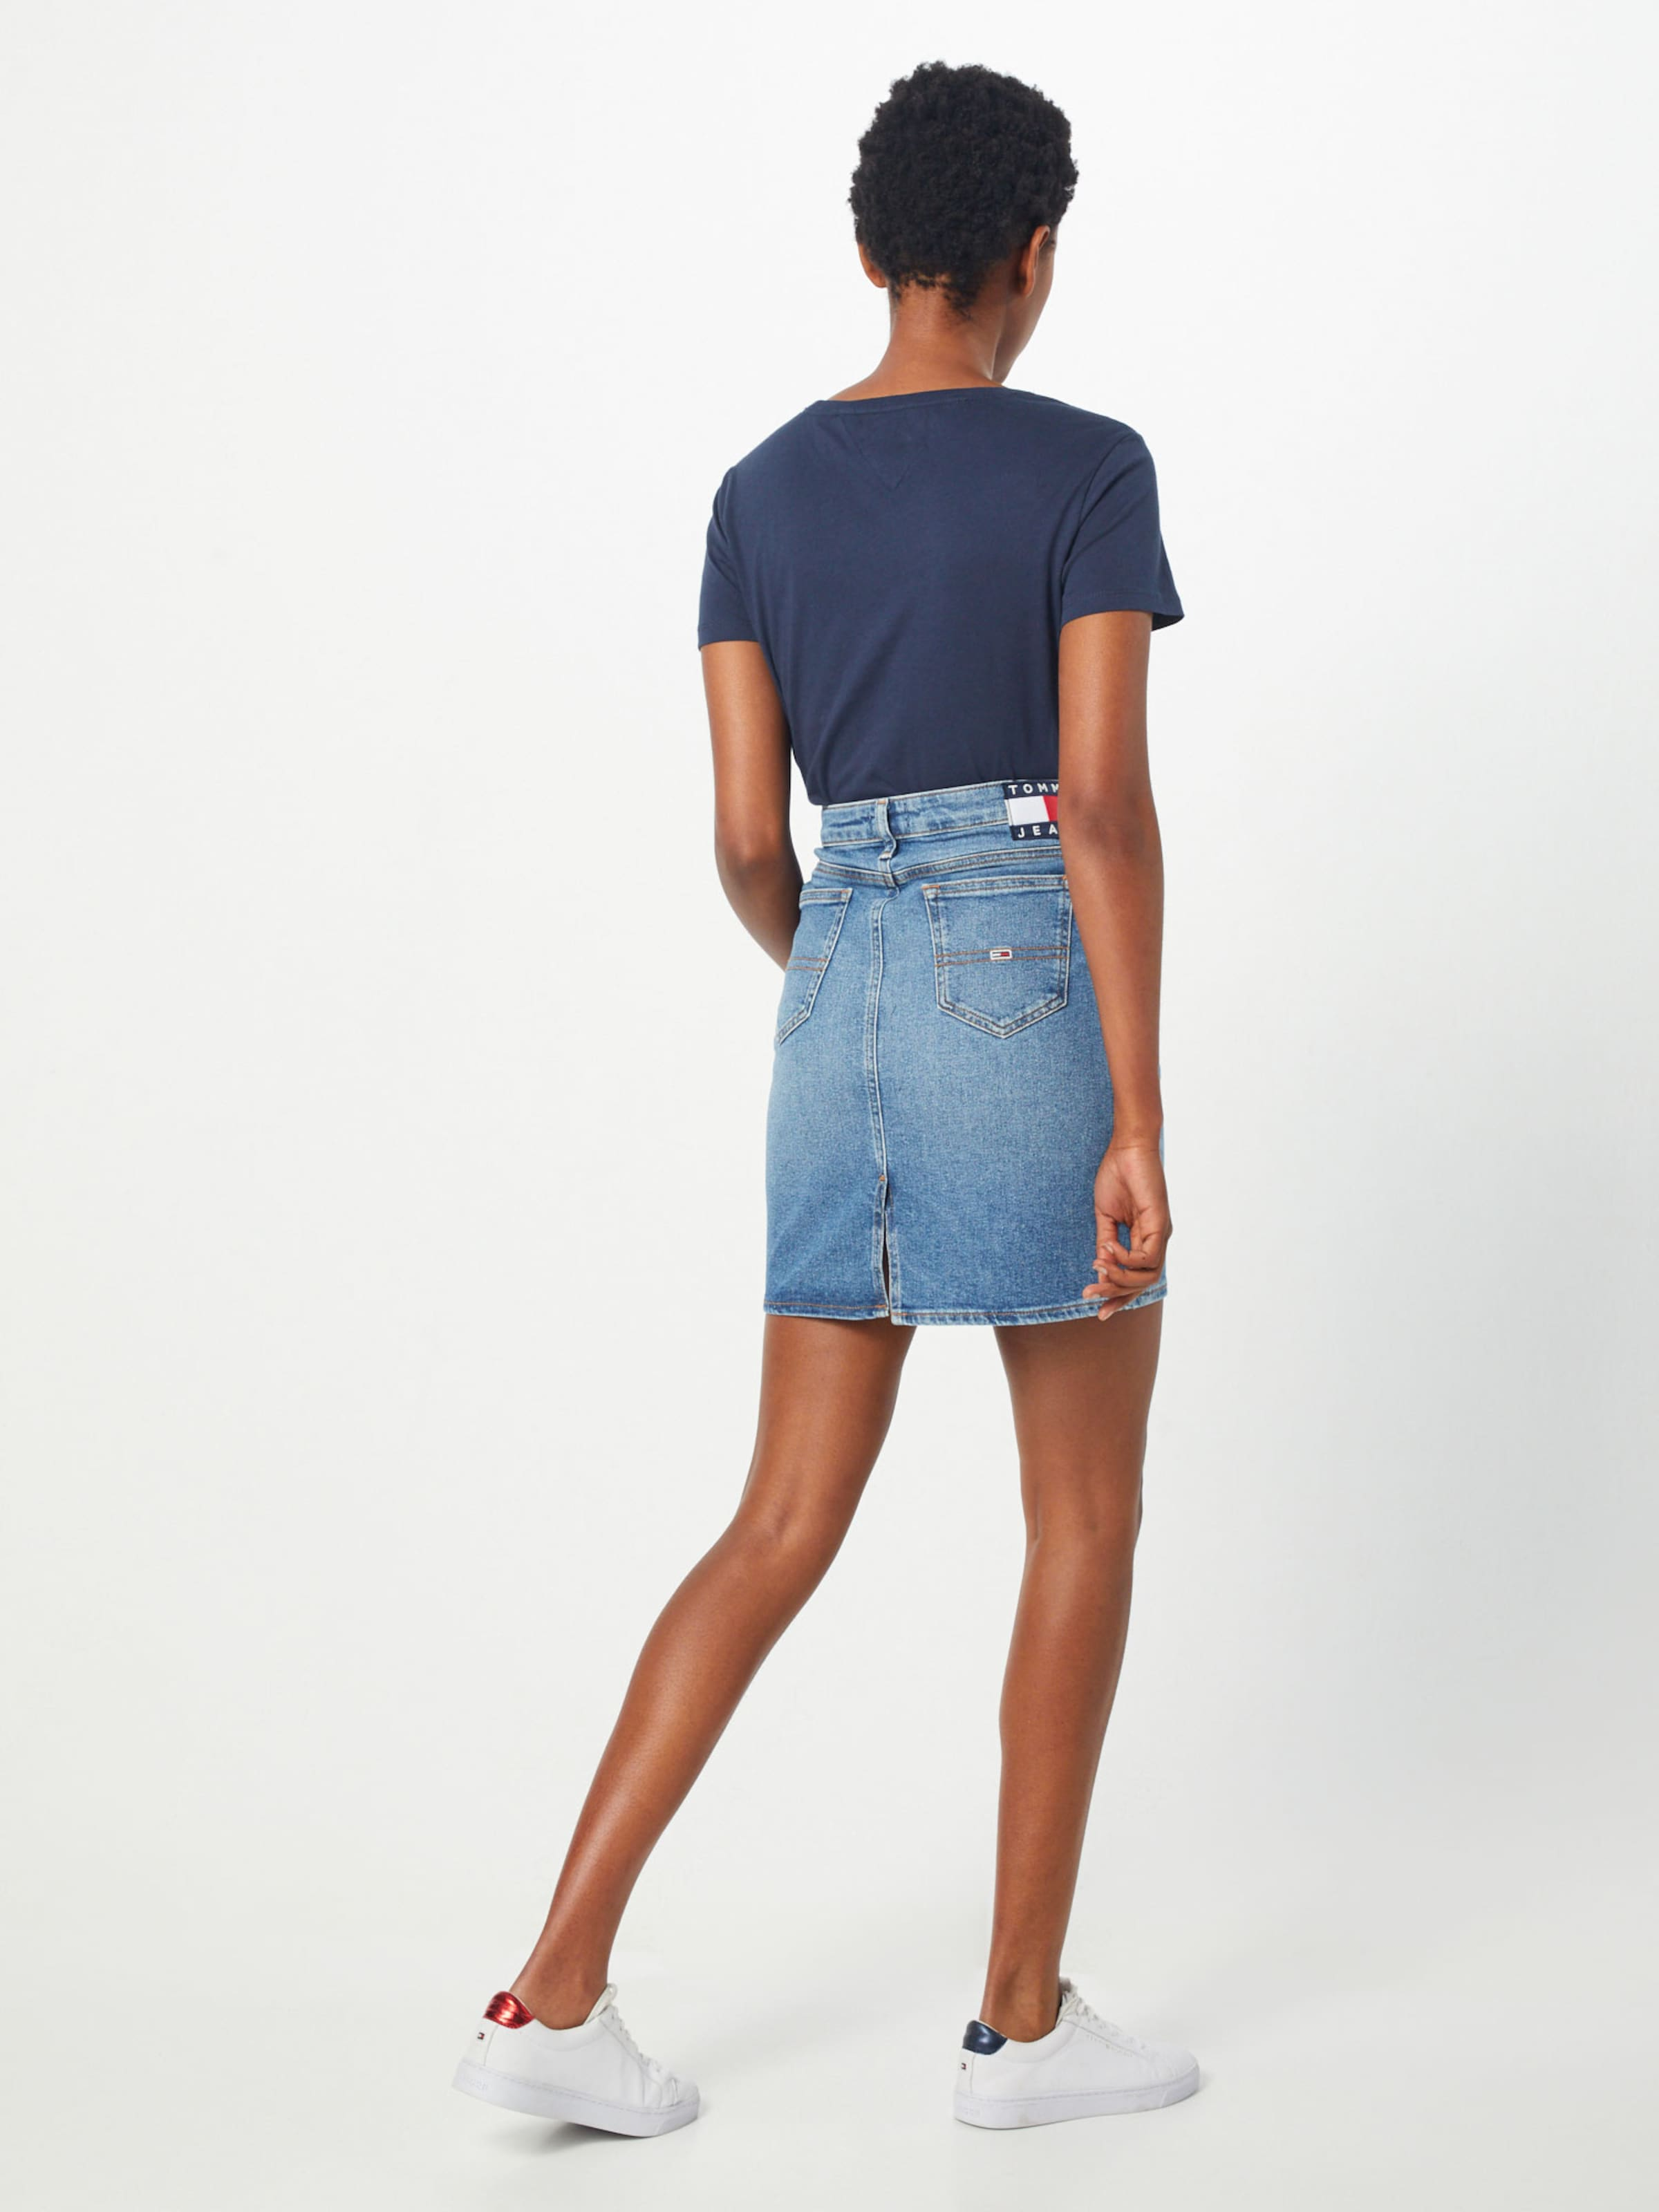 Jeansrock Denim Tommy Jeans Blue In 53AL4jRq